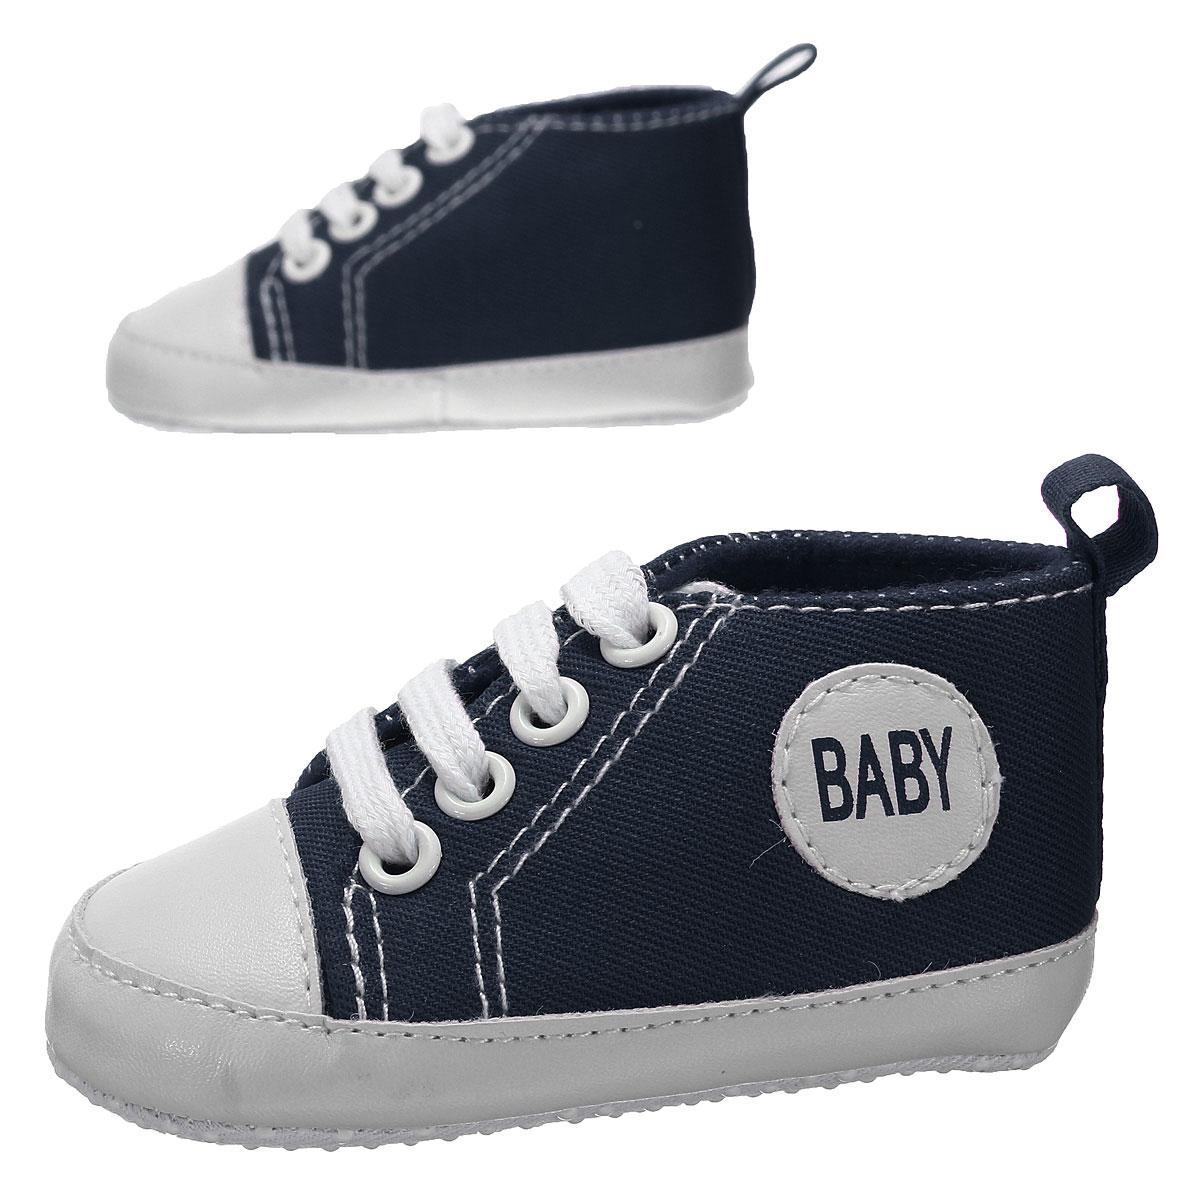 chaussons b b chaussures marche semelle souple 0 18 mois fille gar on 11 13cm ebay. Black Bedroom Furniture Sets. Home Design Ideas